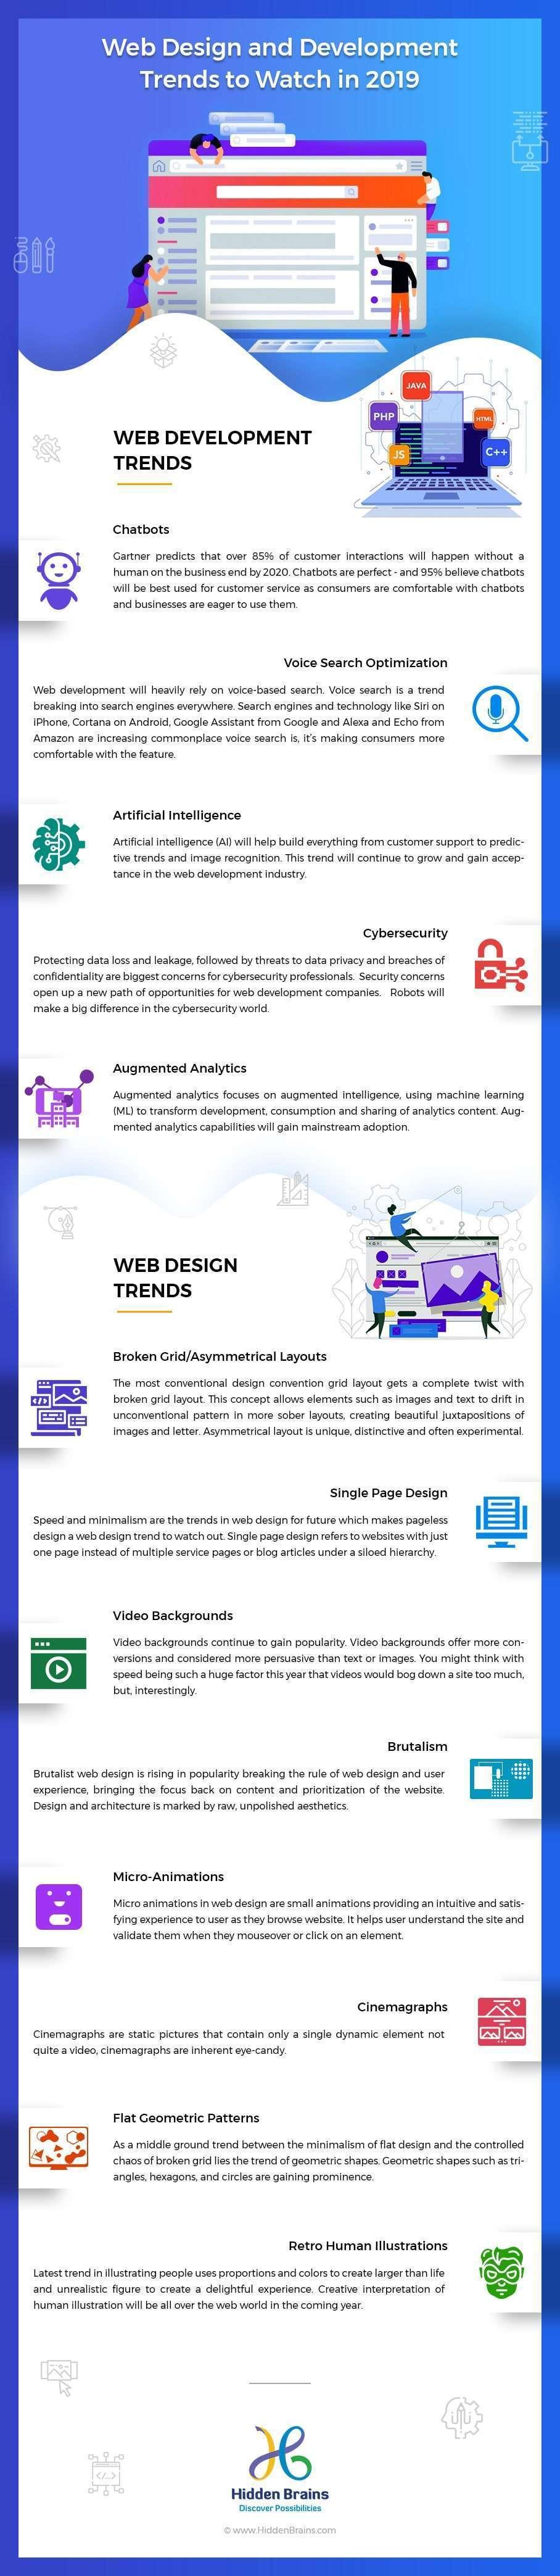 latest web development trends